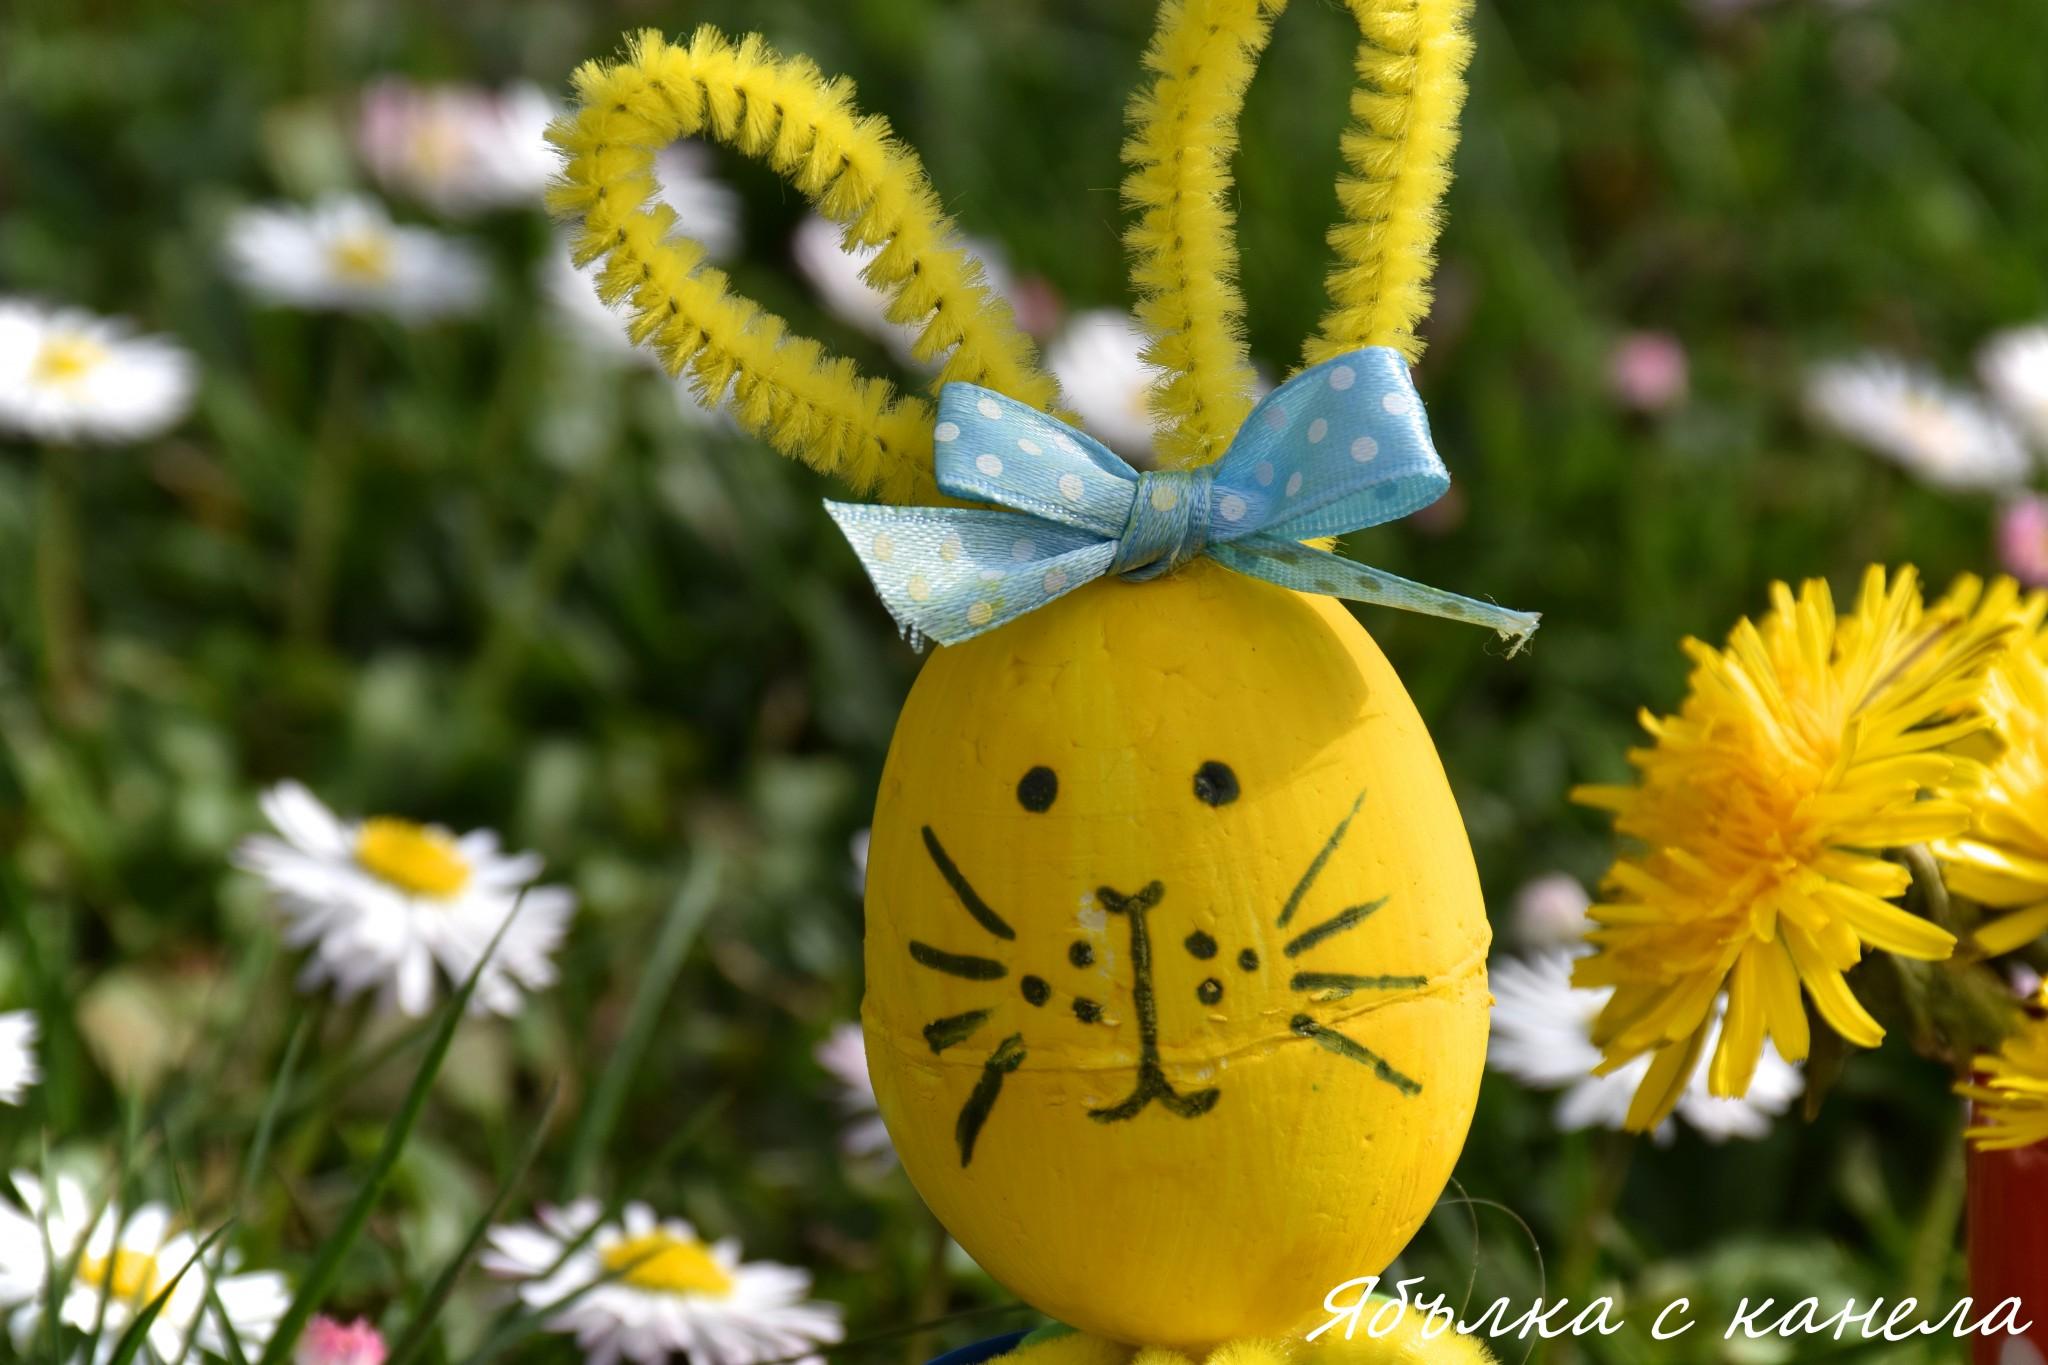 Yewoll bunny